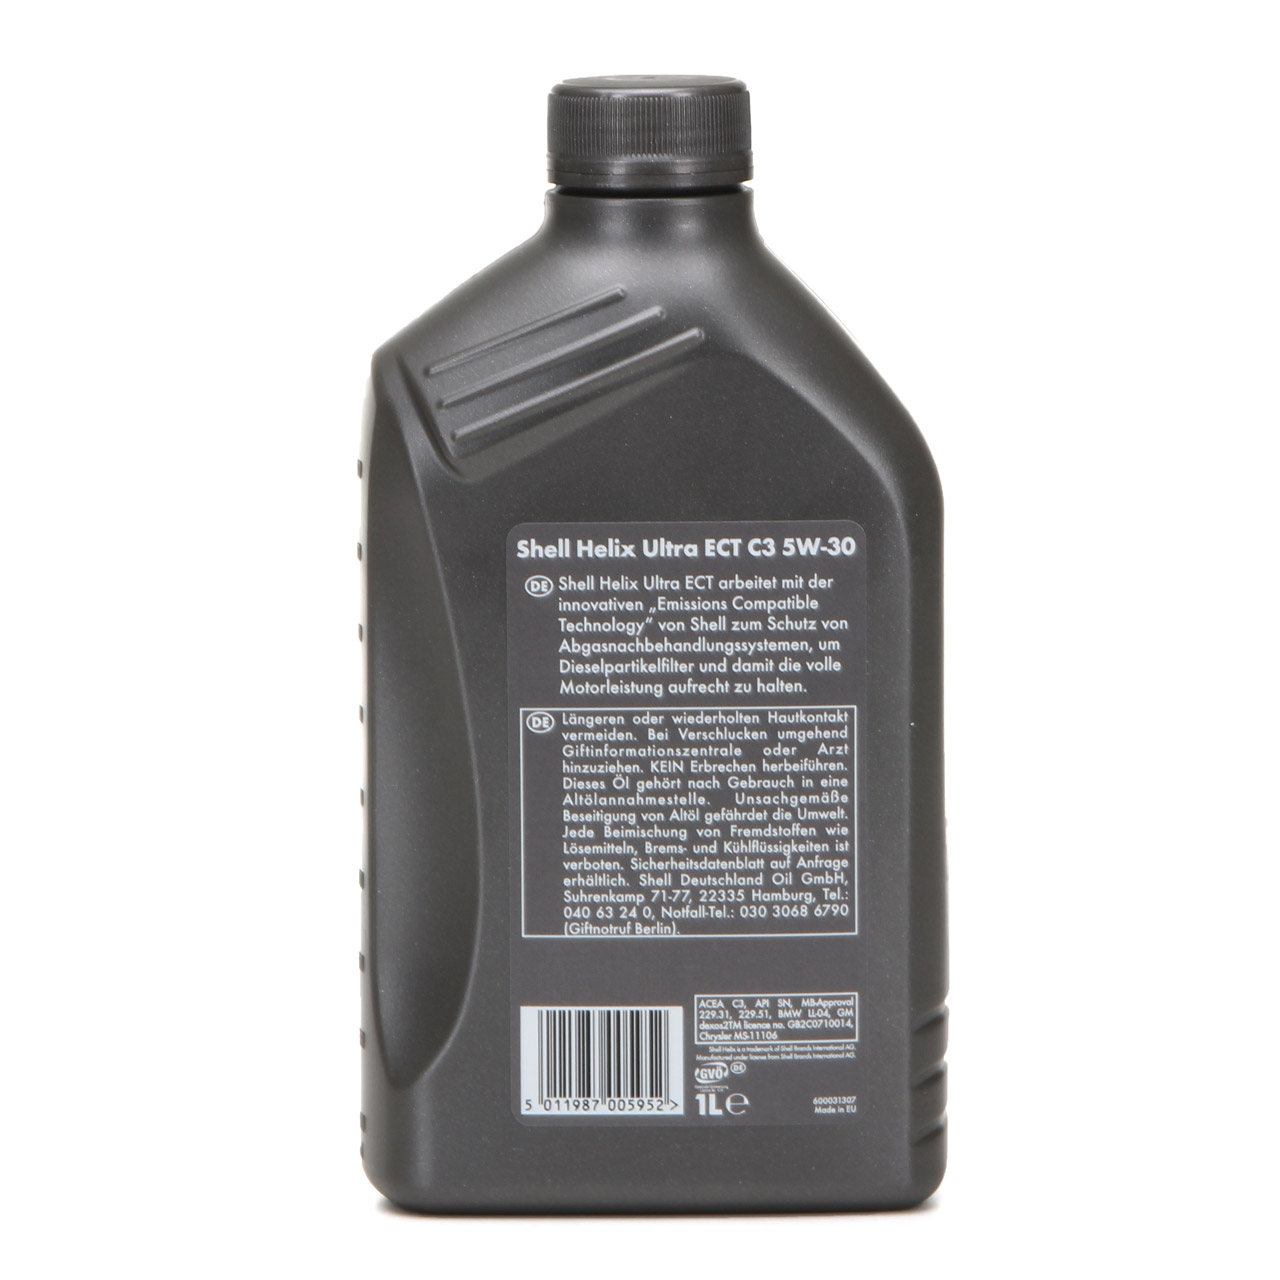 SHELL Motoröl Öl HELIX ULTRA ECT C3 5W30 dexos2 BMW LL-04 MB 229.51 - 1L 1 Liter